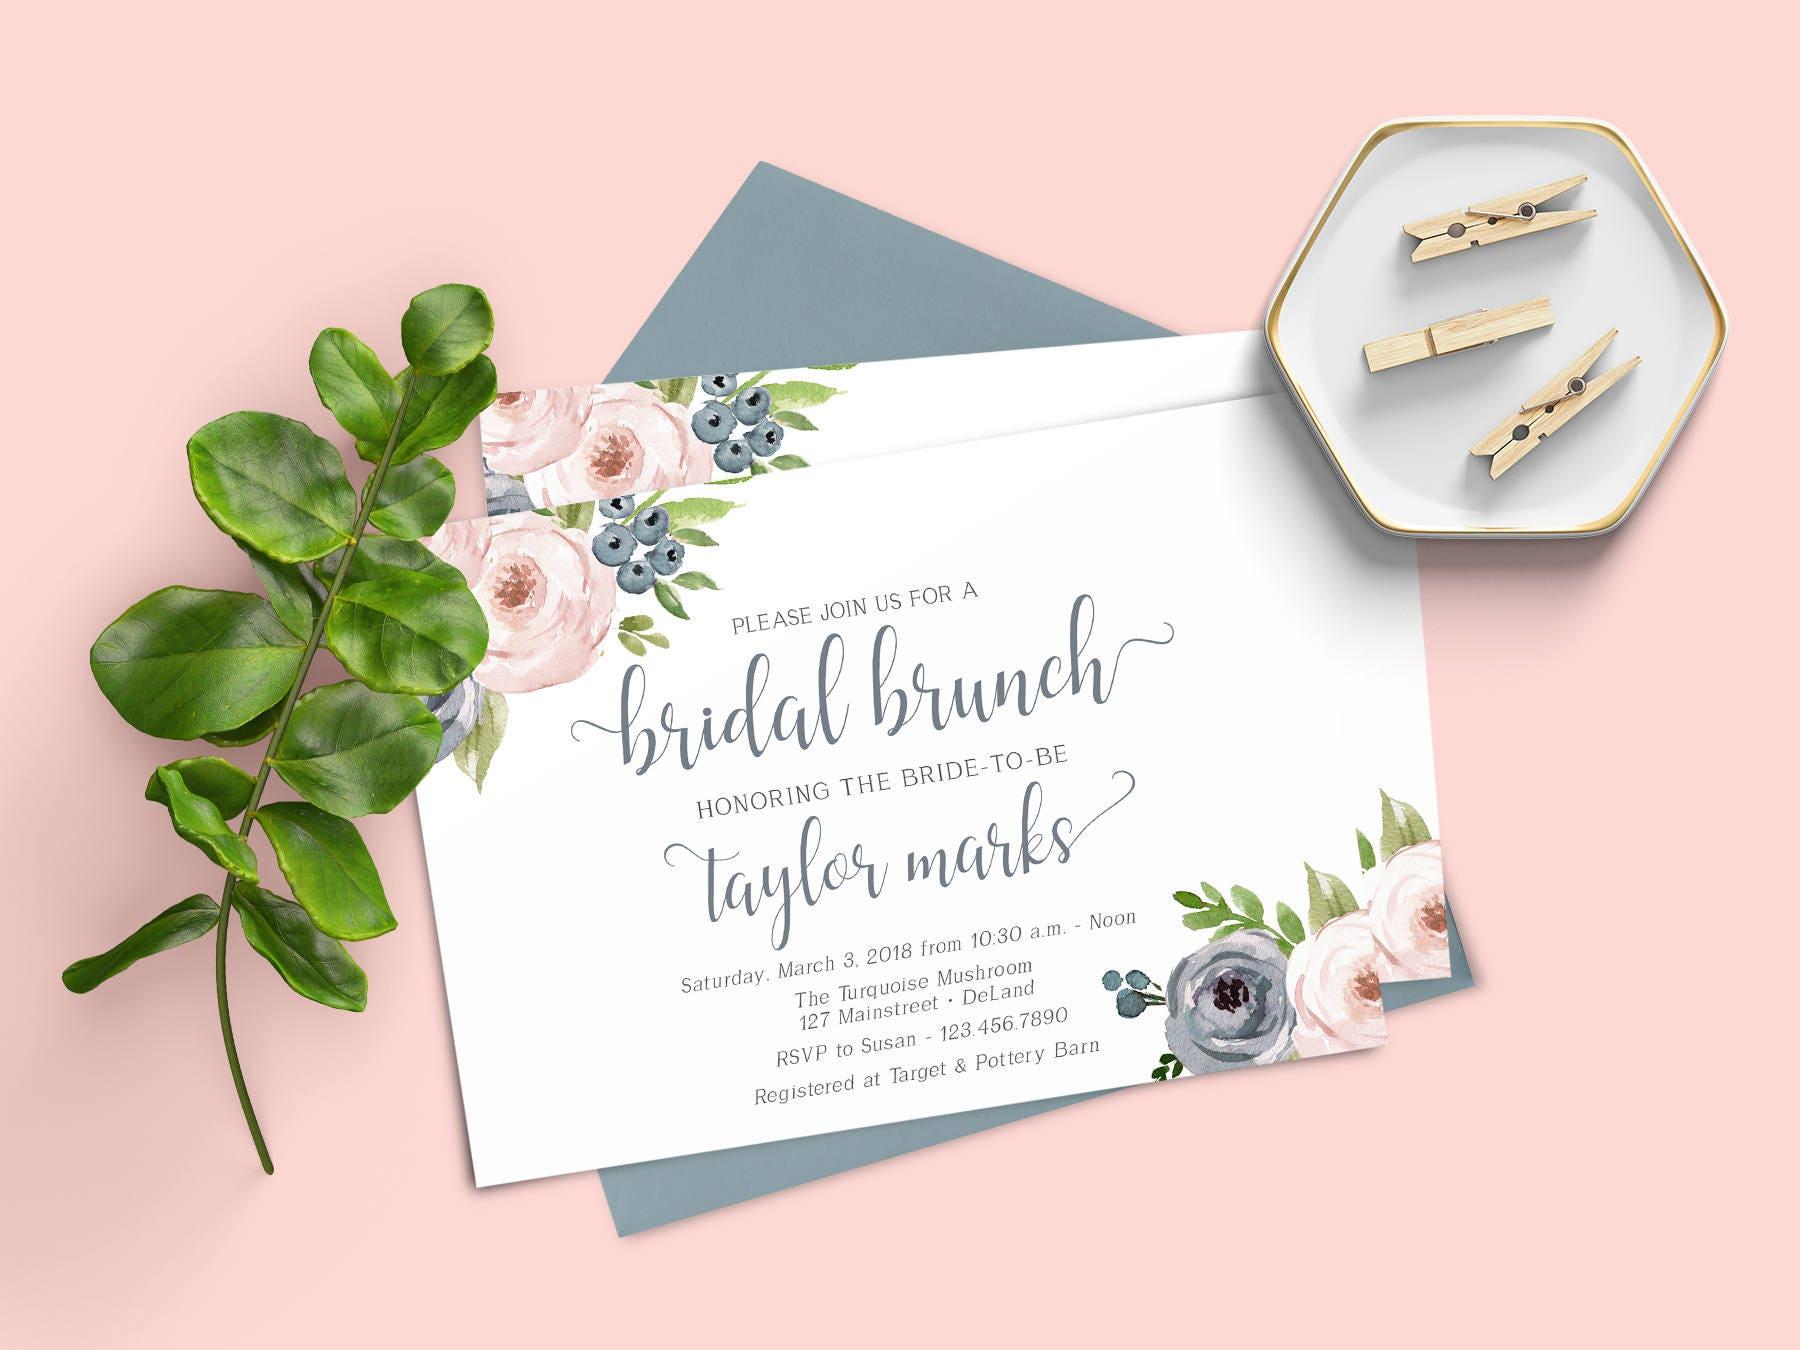 Brunch Bridal Shower Invitation Invitation Template Dusty | Etsy